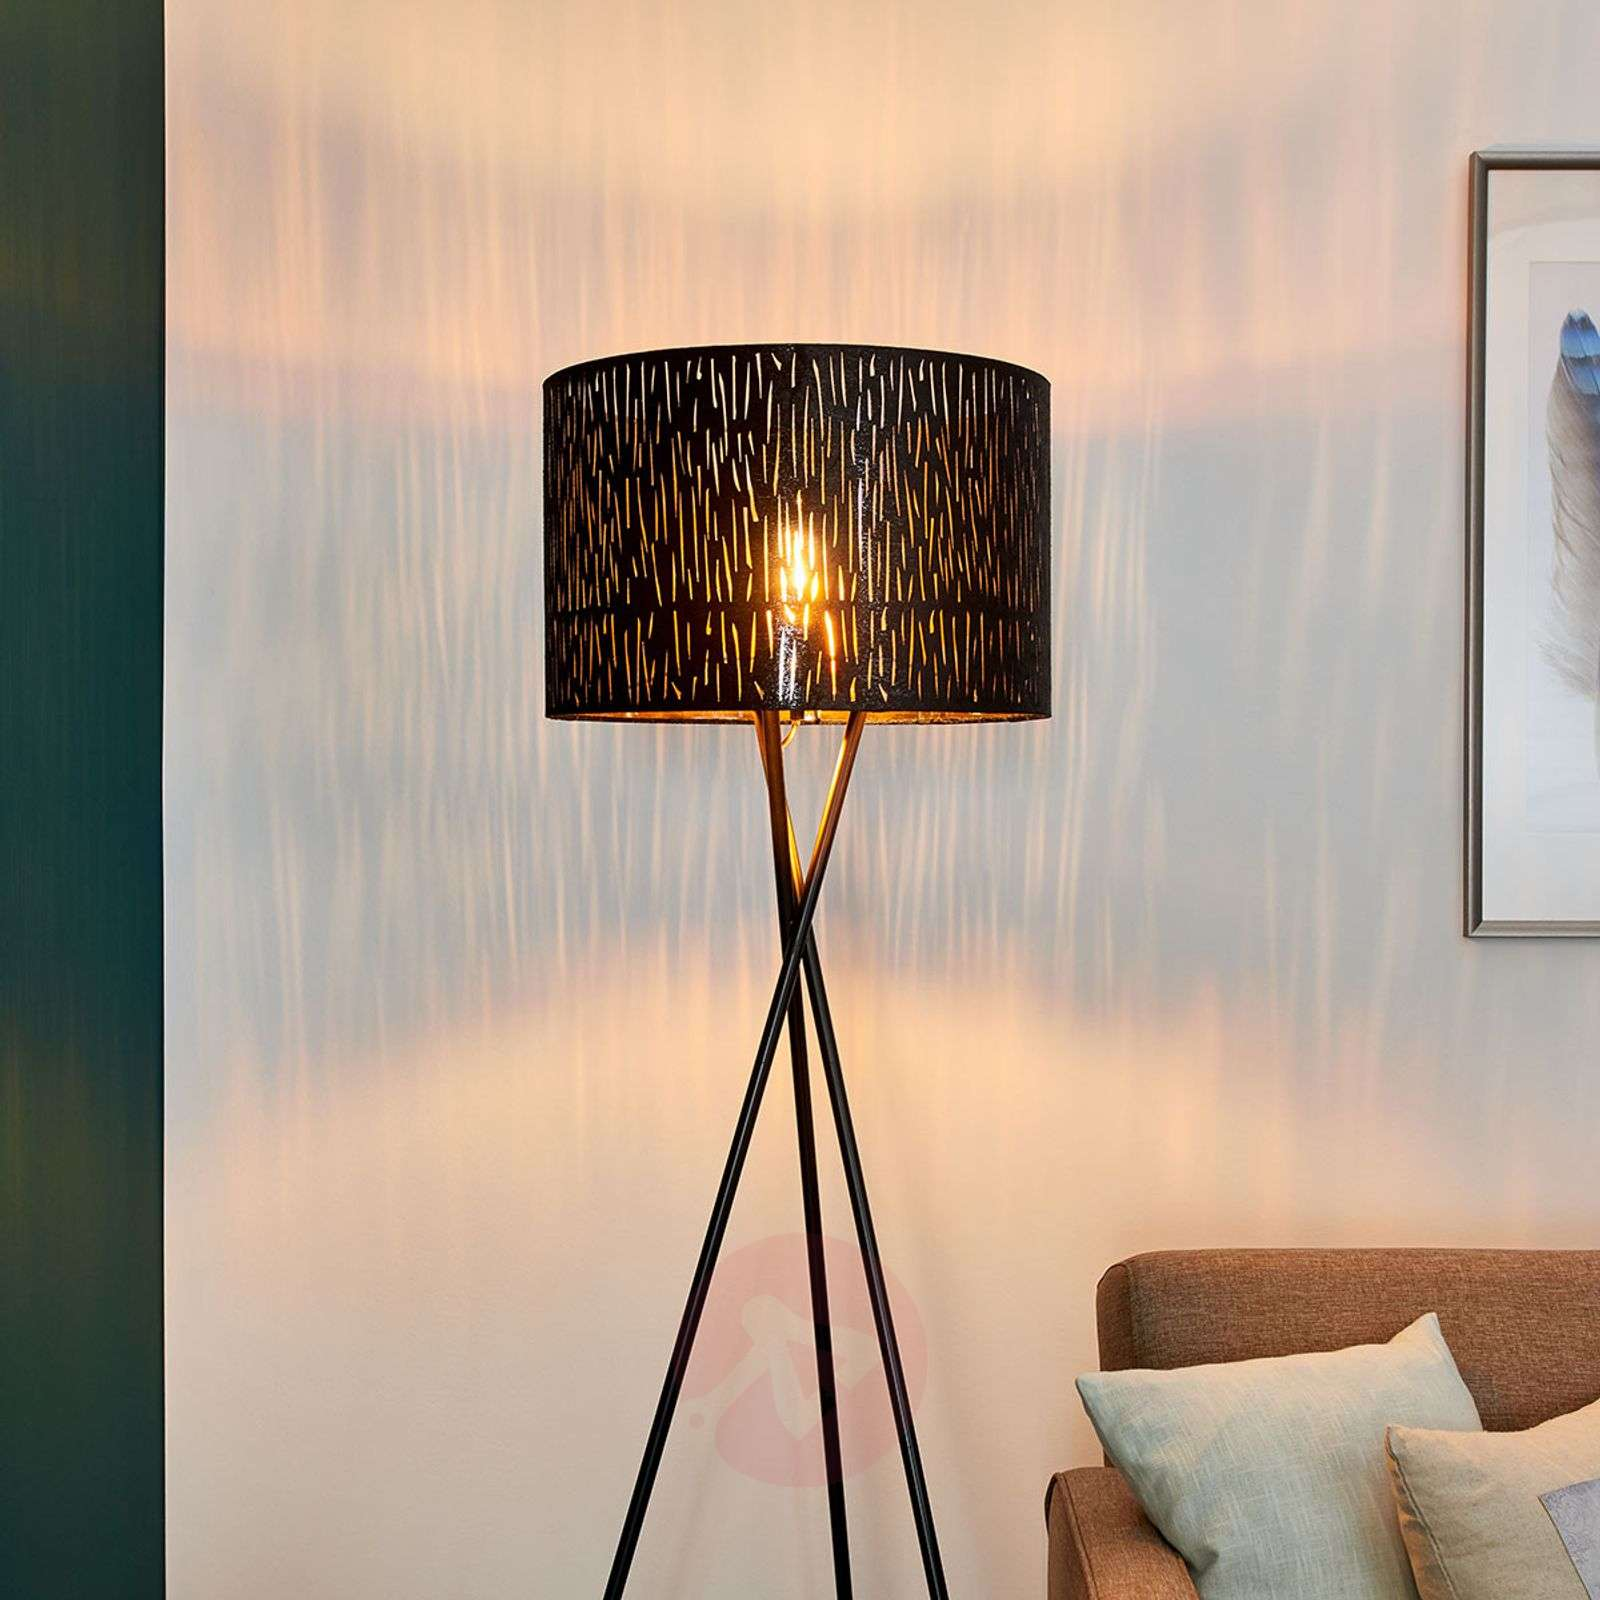 Tripod floor lamp Jules, black and gold-4018111-02